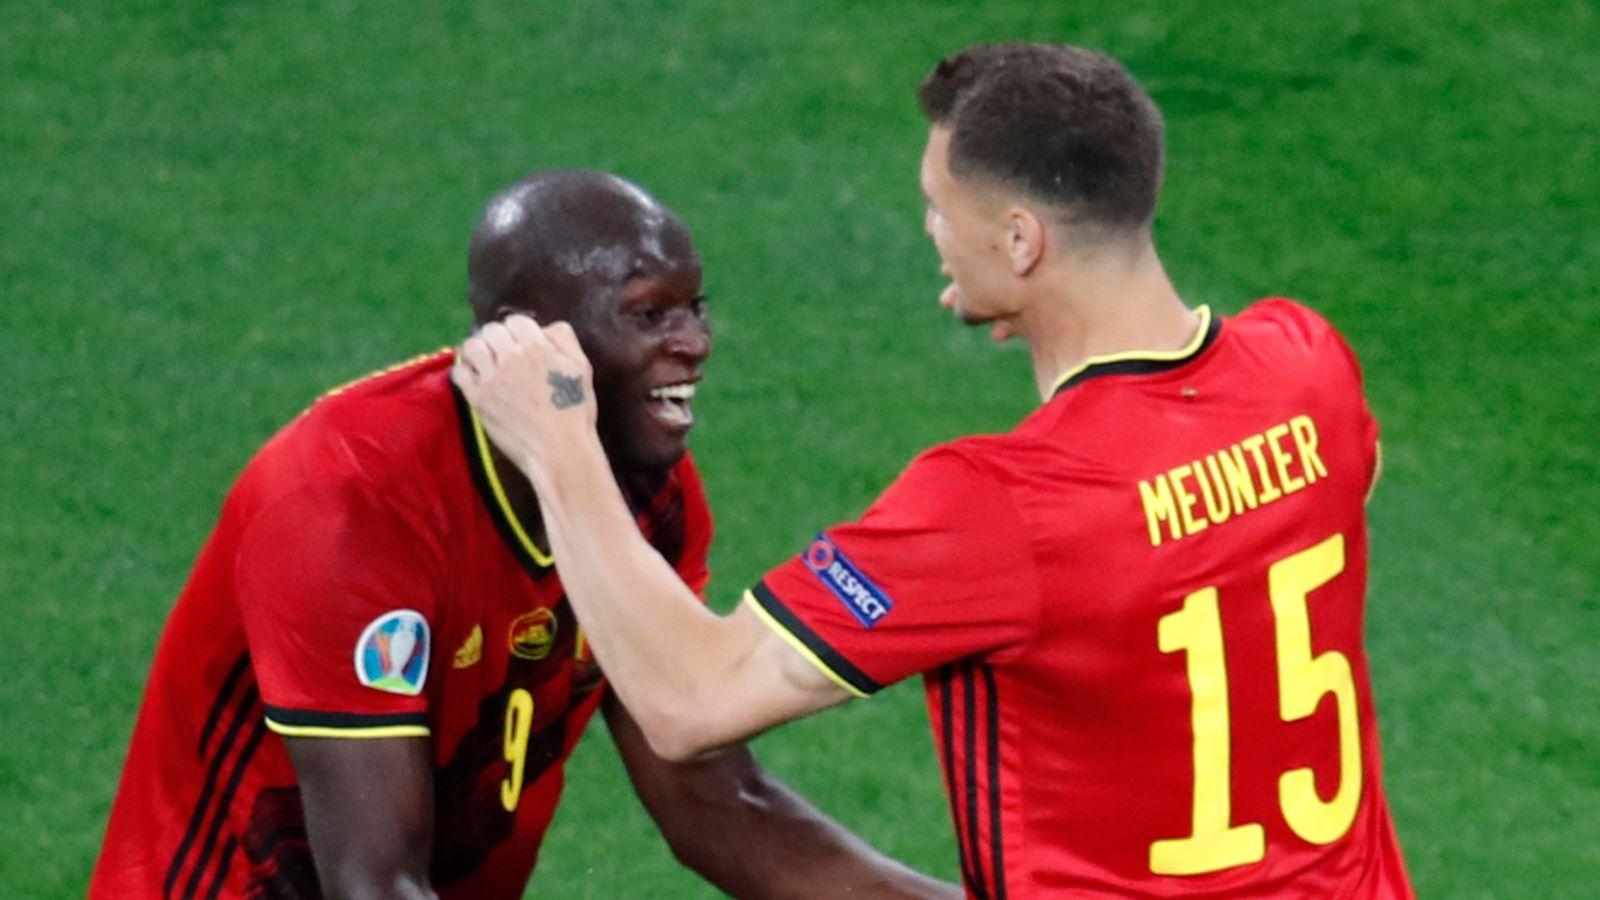 Euro 2020 Preview and Best Bets: Ukraine vs North Macedonia, Denmark vs Belgium, and Netherlands vs Austria